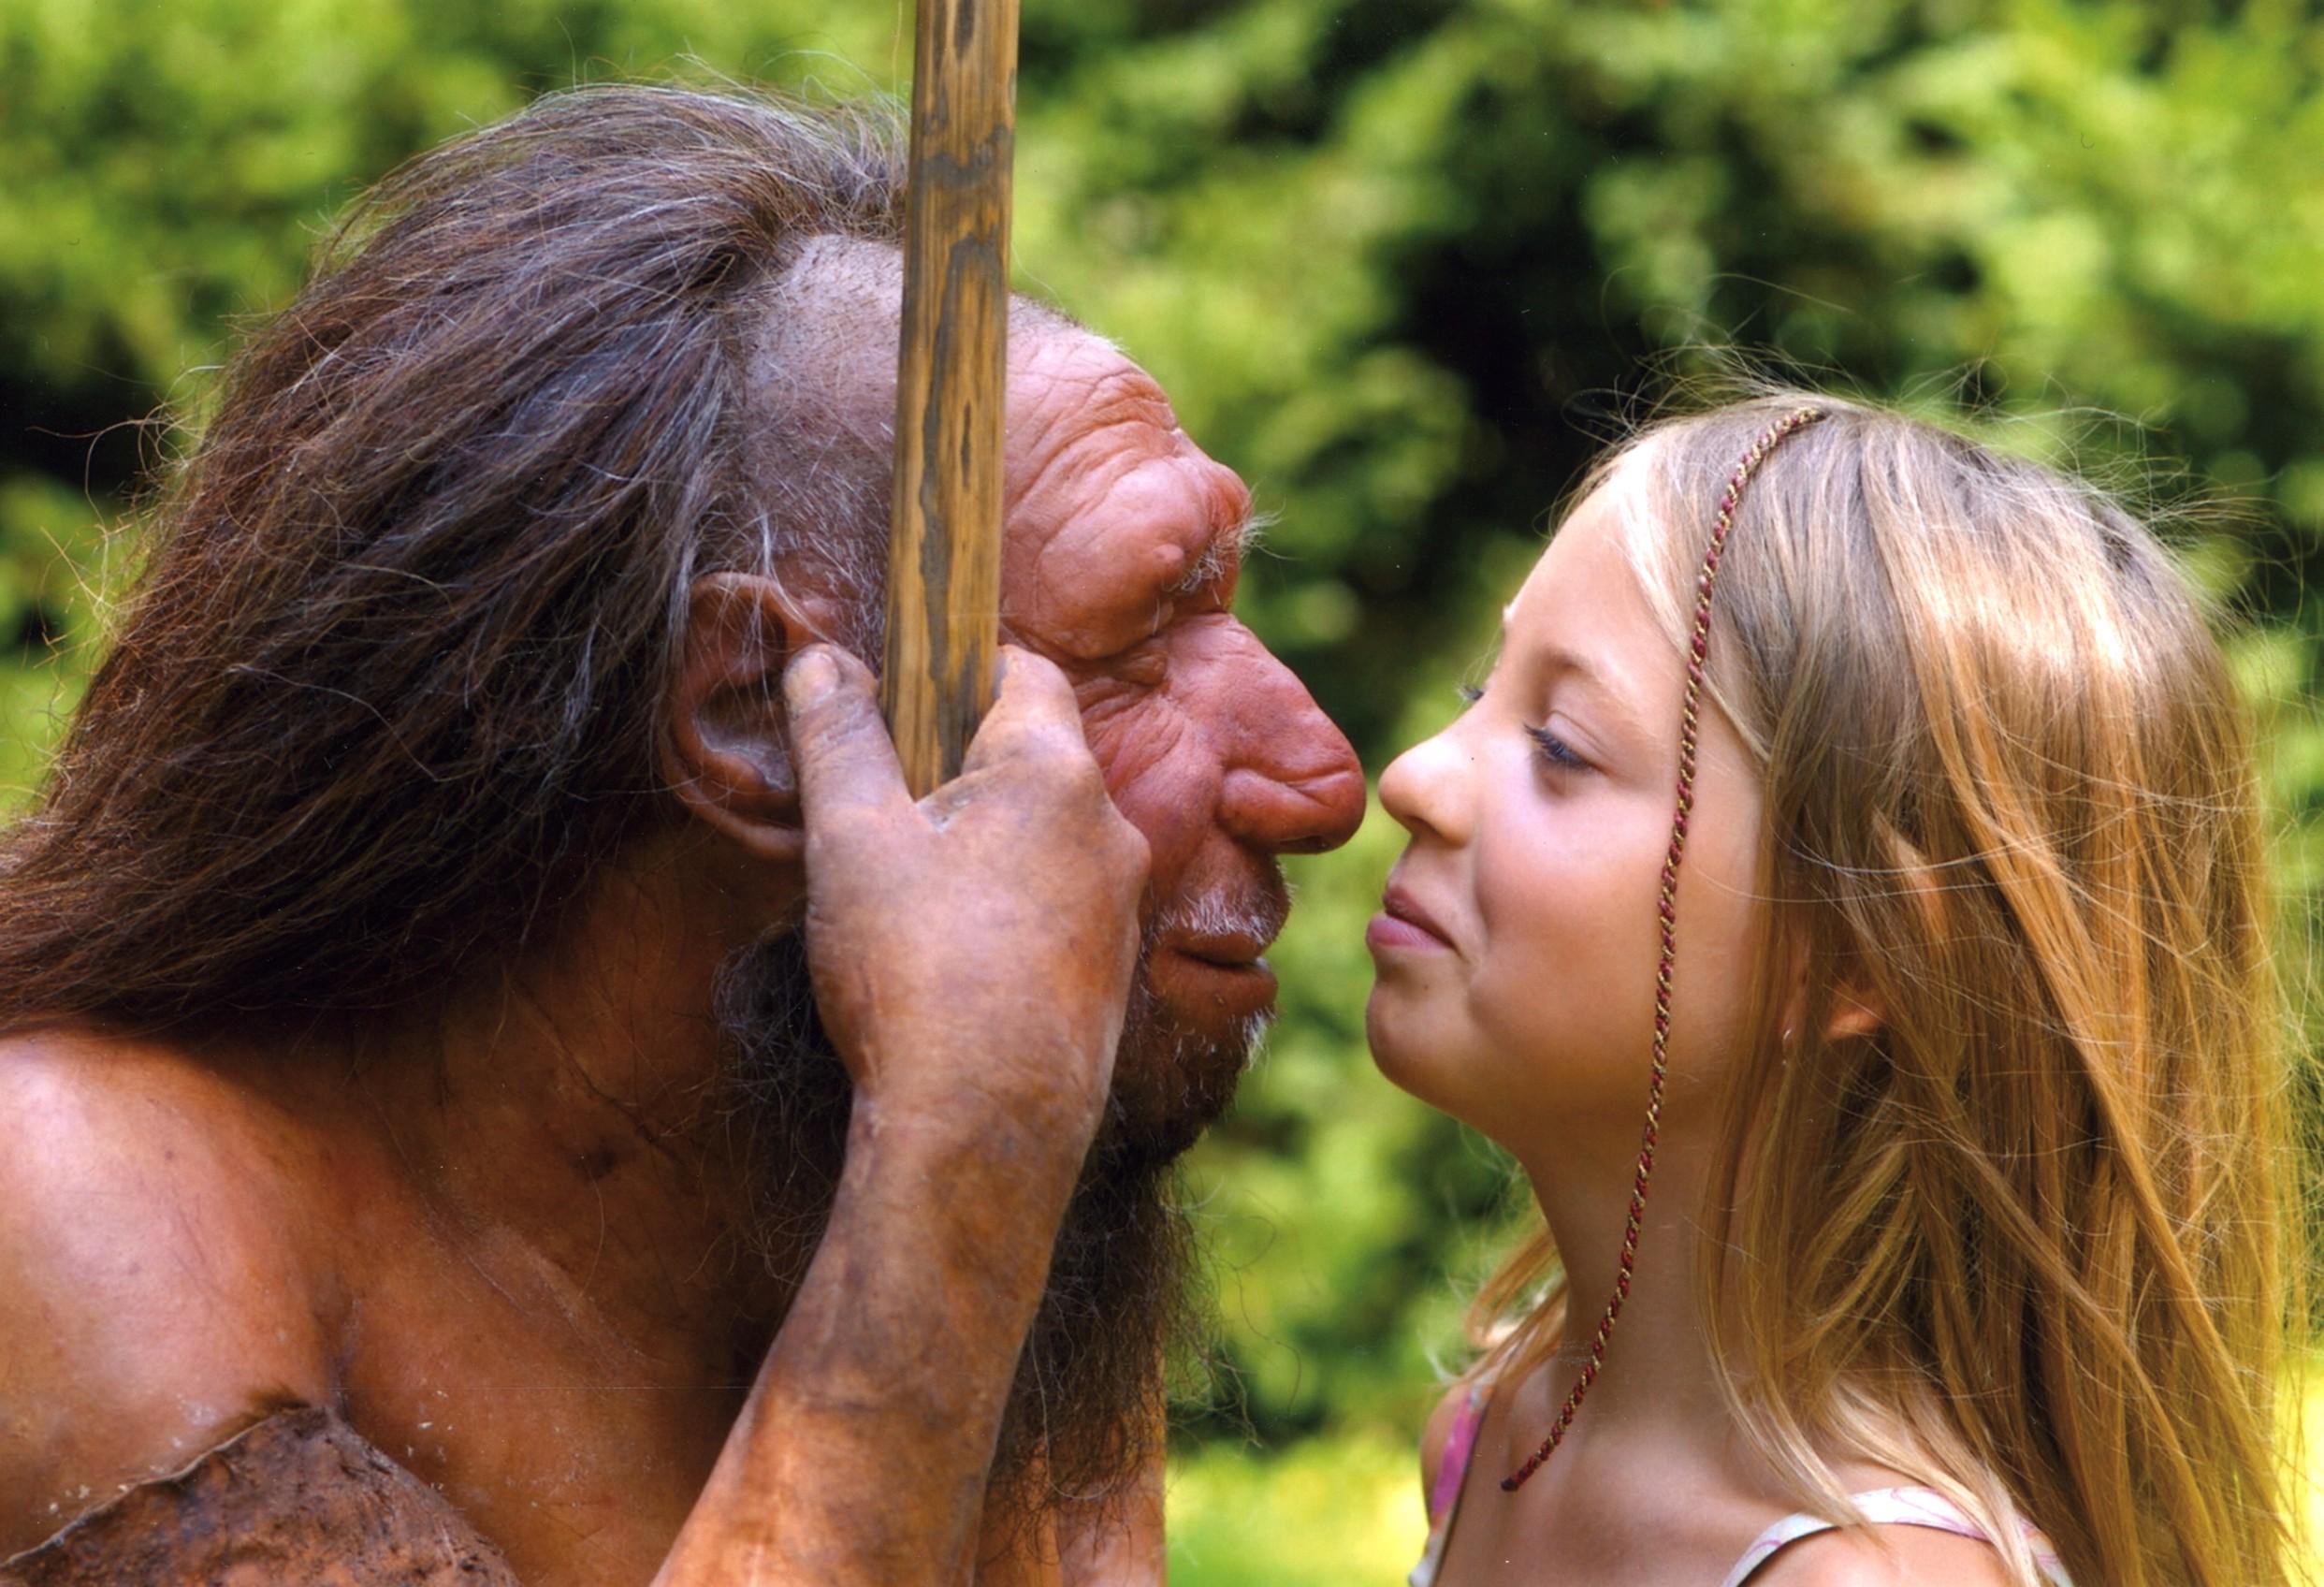 Via: http://www.livescience.com/images/i/000/059/863/iFF/neanderthal-girl-131202.jpeg?1386001695